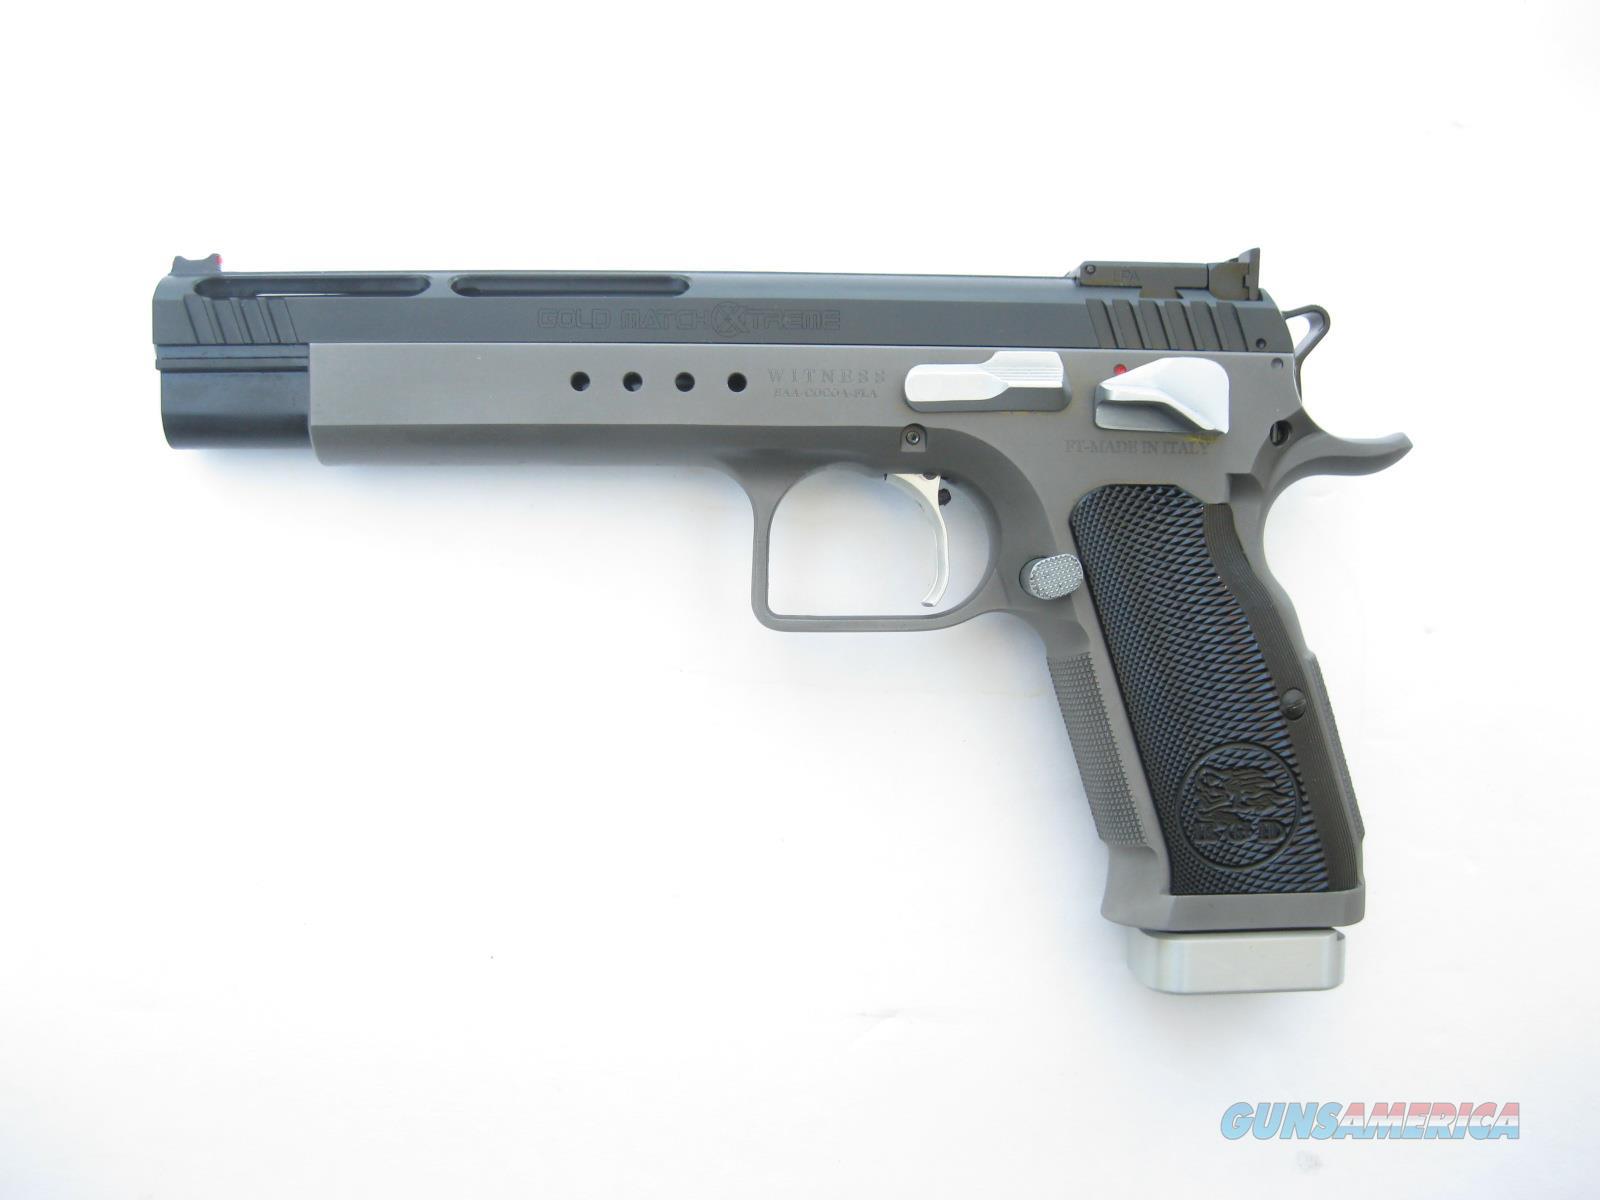 EAA Gold Match XTREME 9mm Longslide Tanfoglio Custom Shop 4 Mags 610660 NIB  Guns > Pistols > EAA Pistols > Other